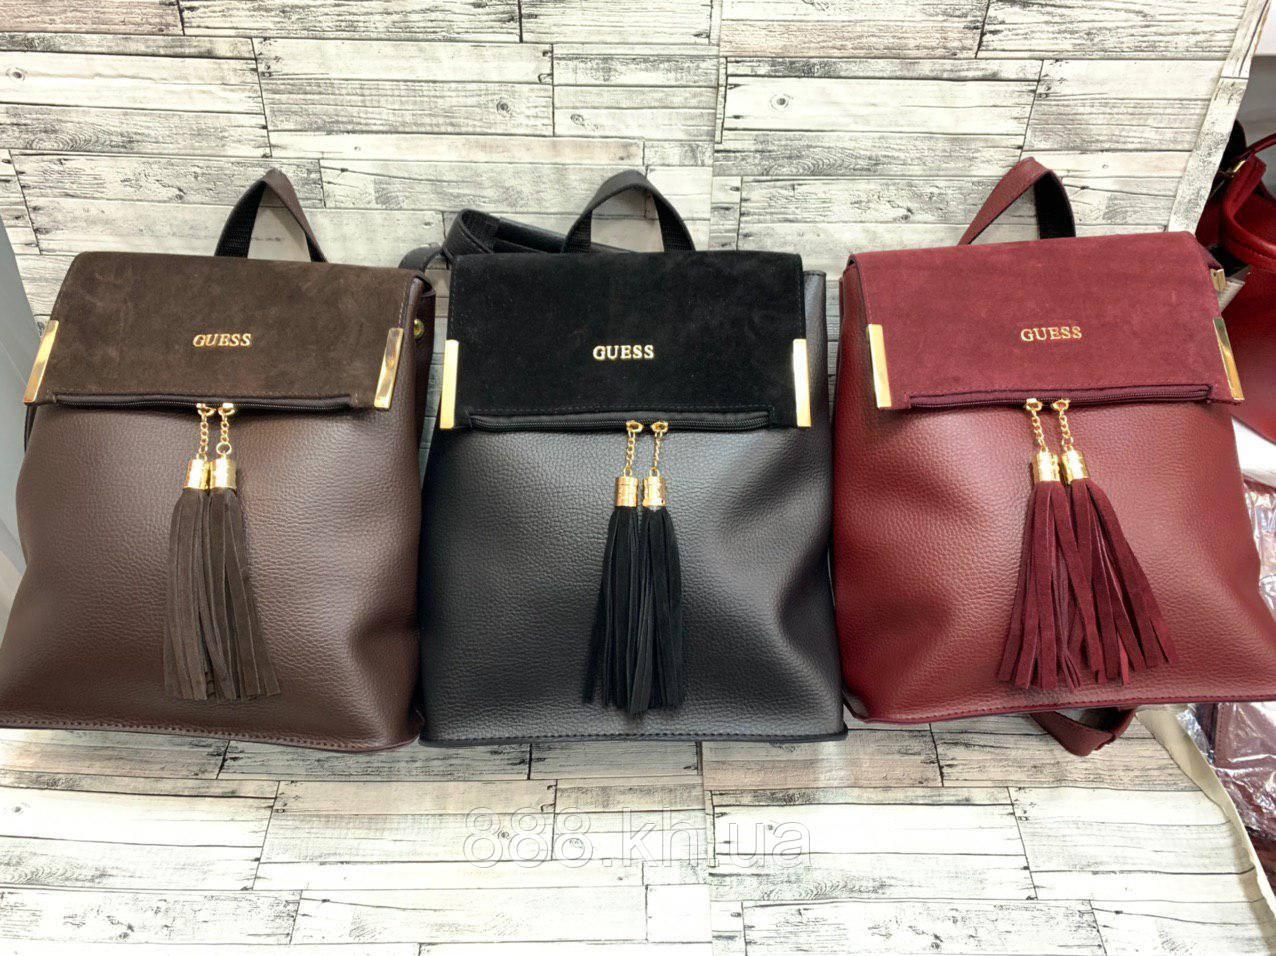 Стильная женская сумка-рюкзак Guess , сумка для прогулок, натуральная замша